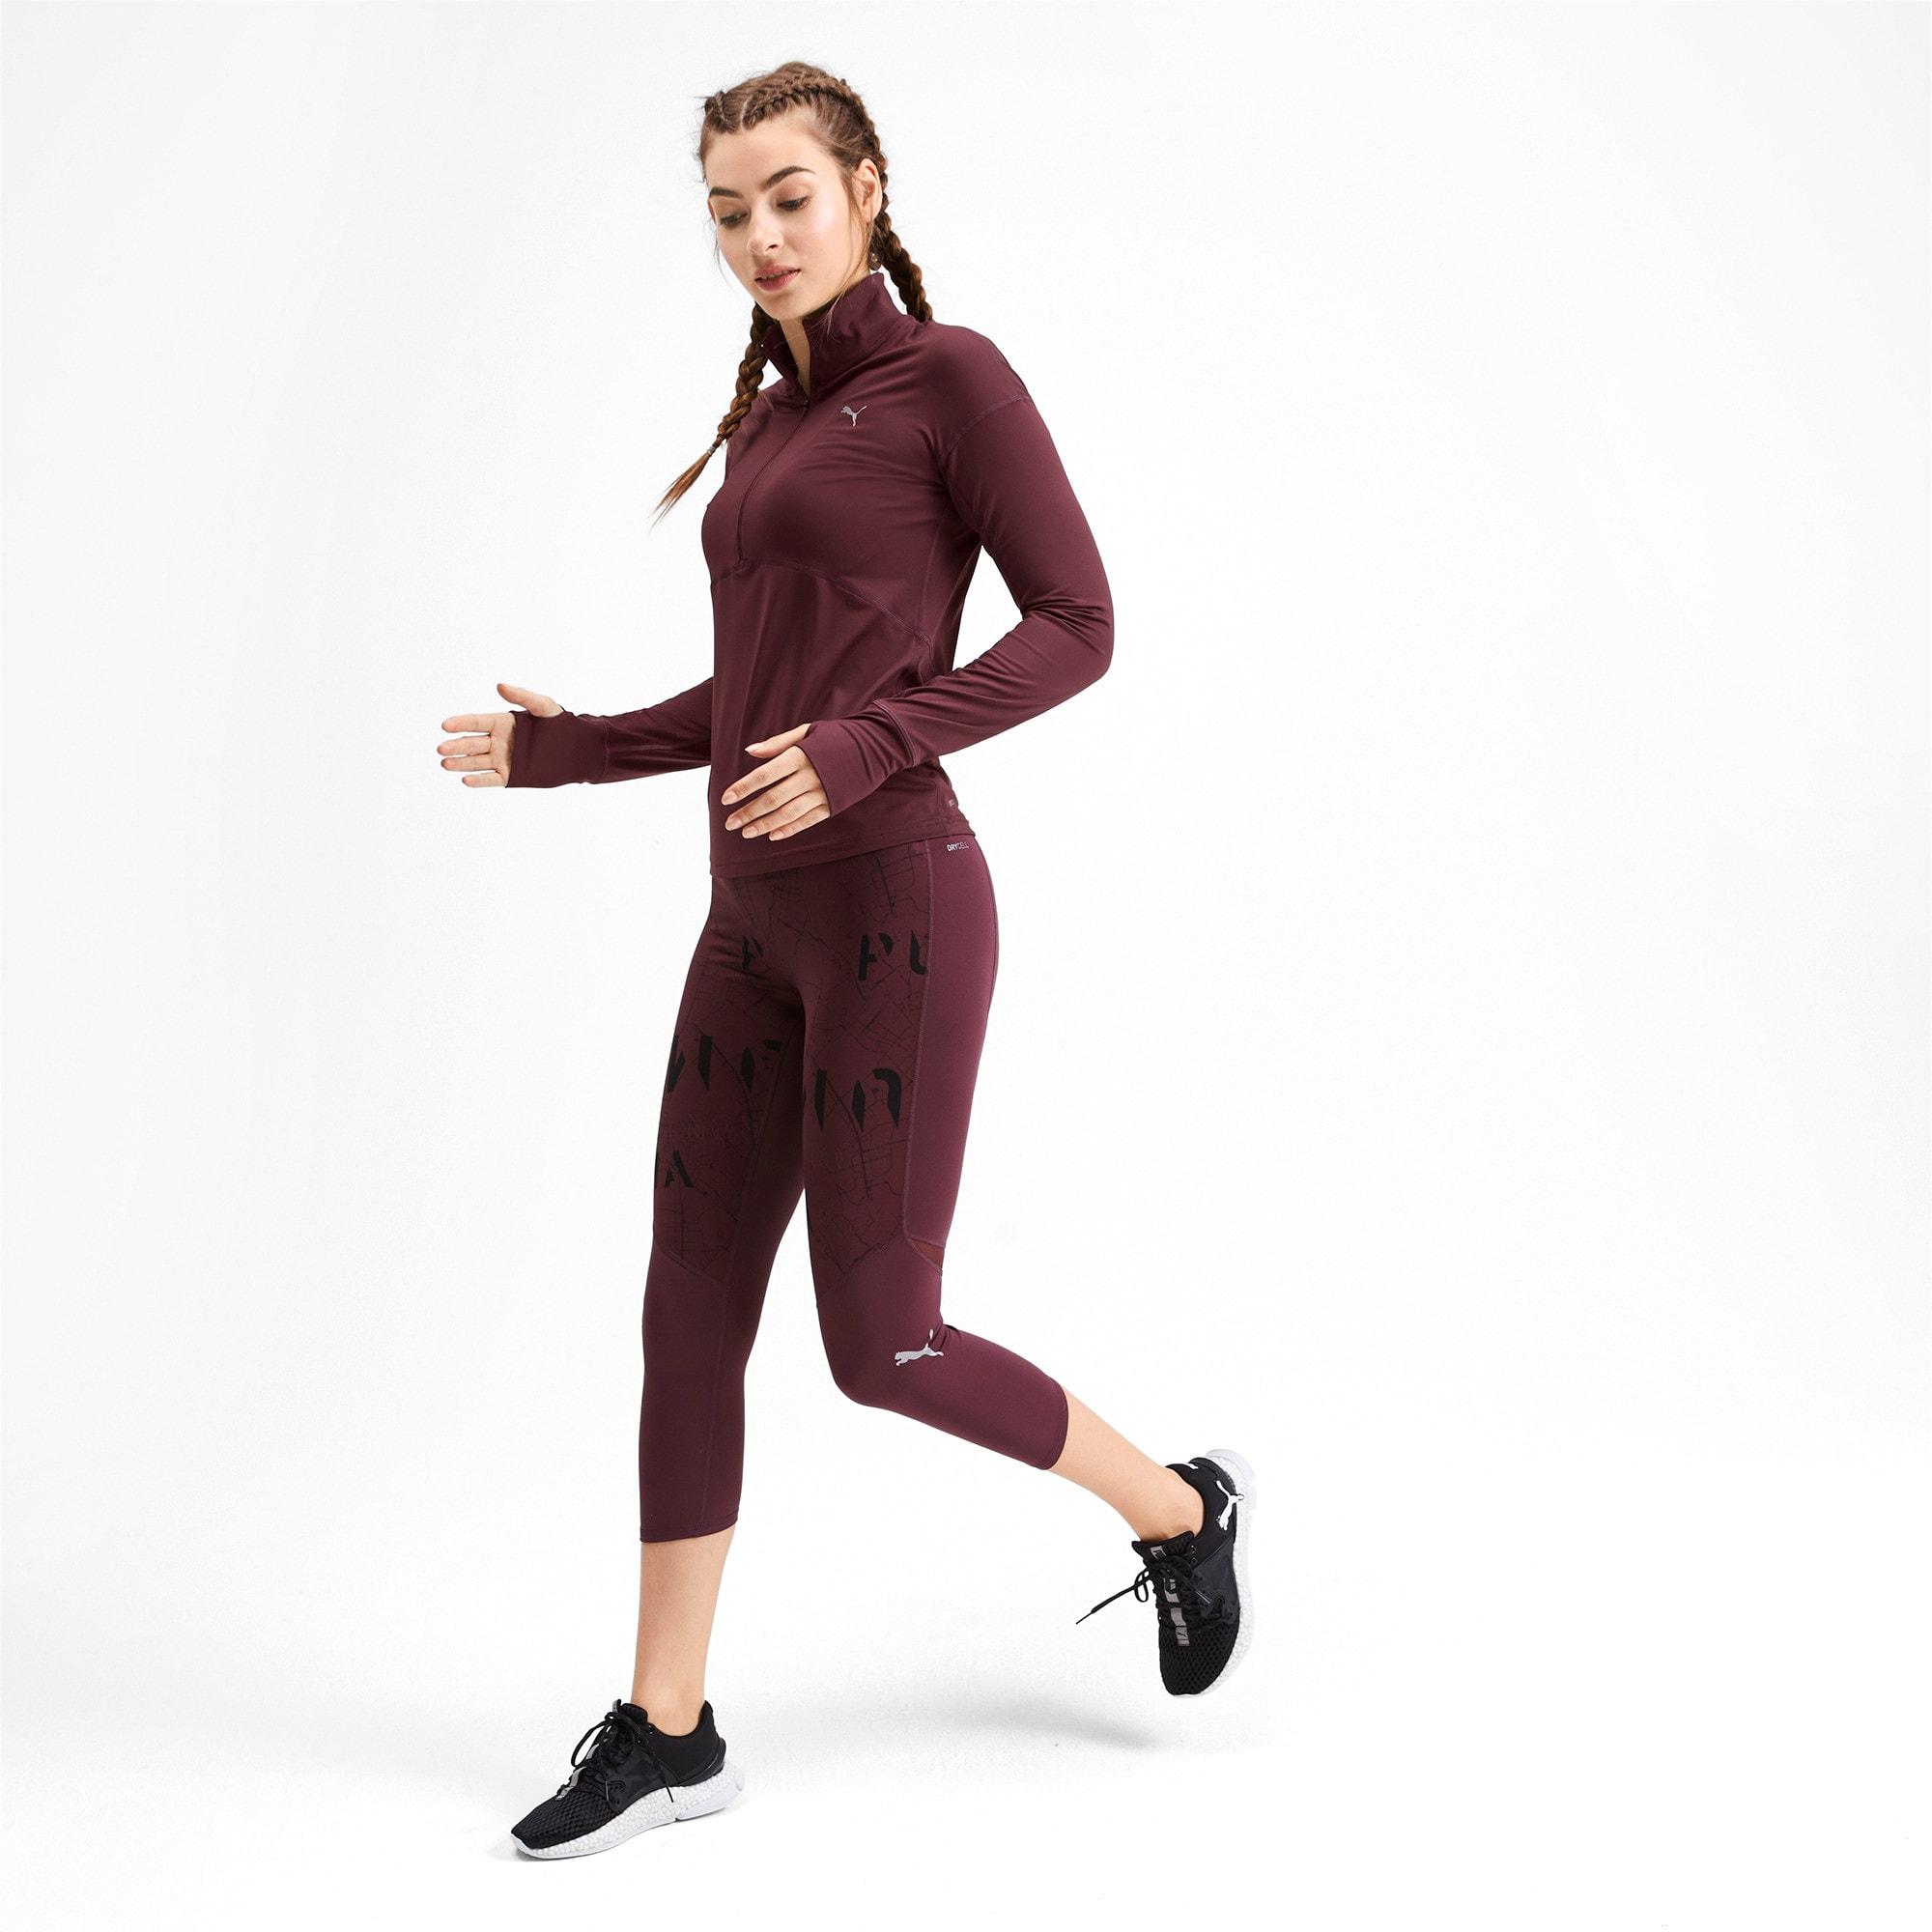 Thumbnail 3 of Ignite Long Sleeve Women's Running Pullover, Vineyard Wine, medium